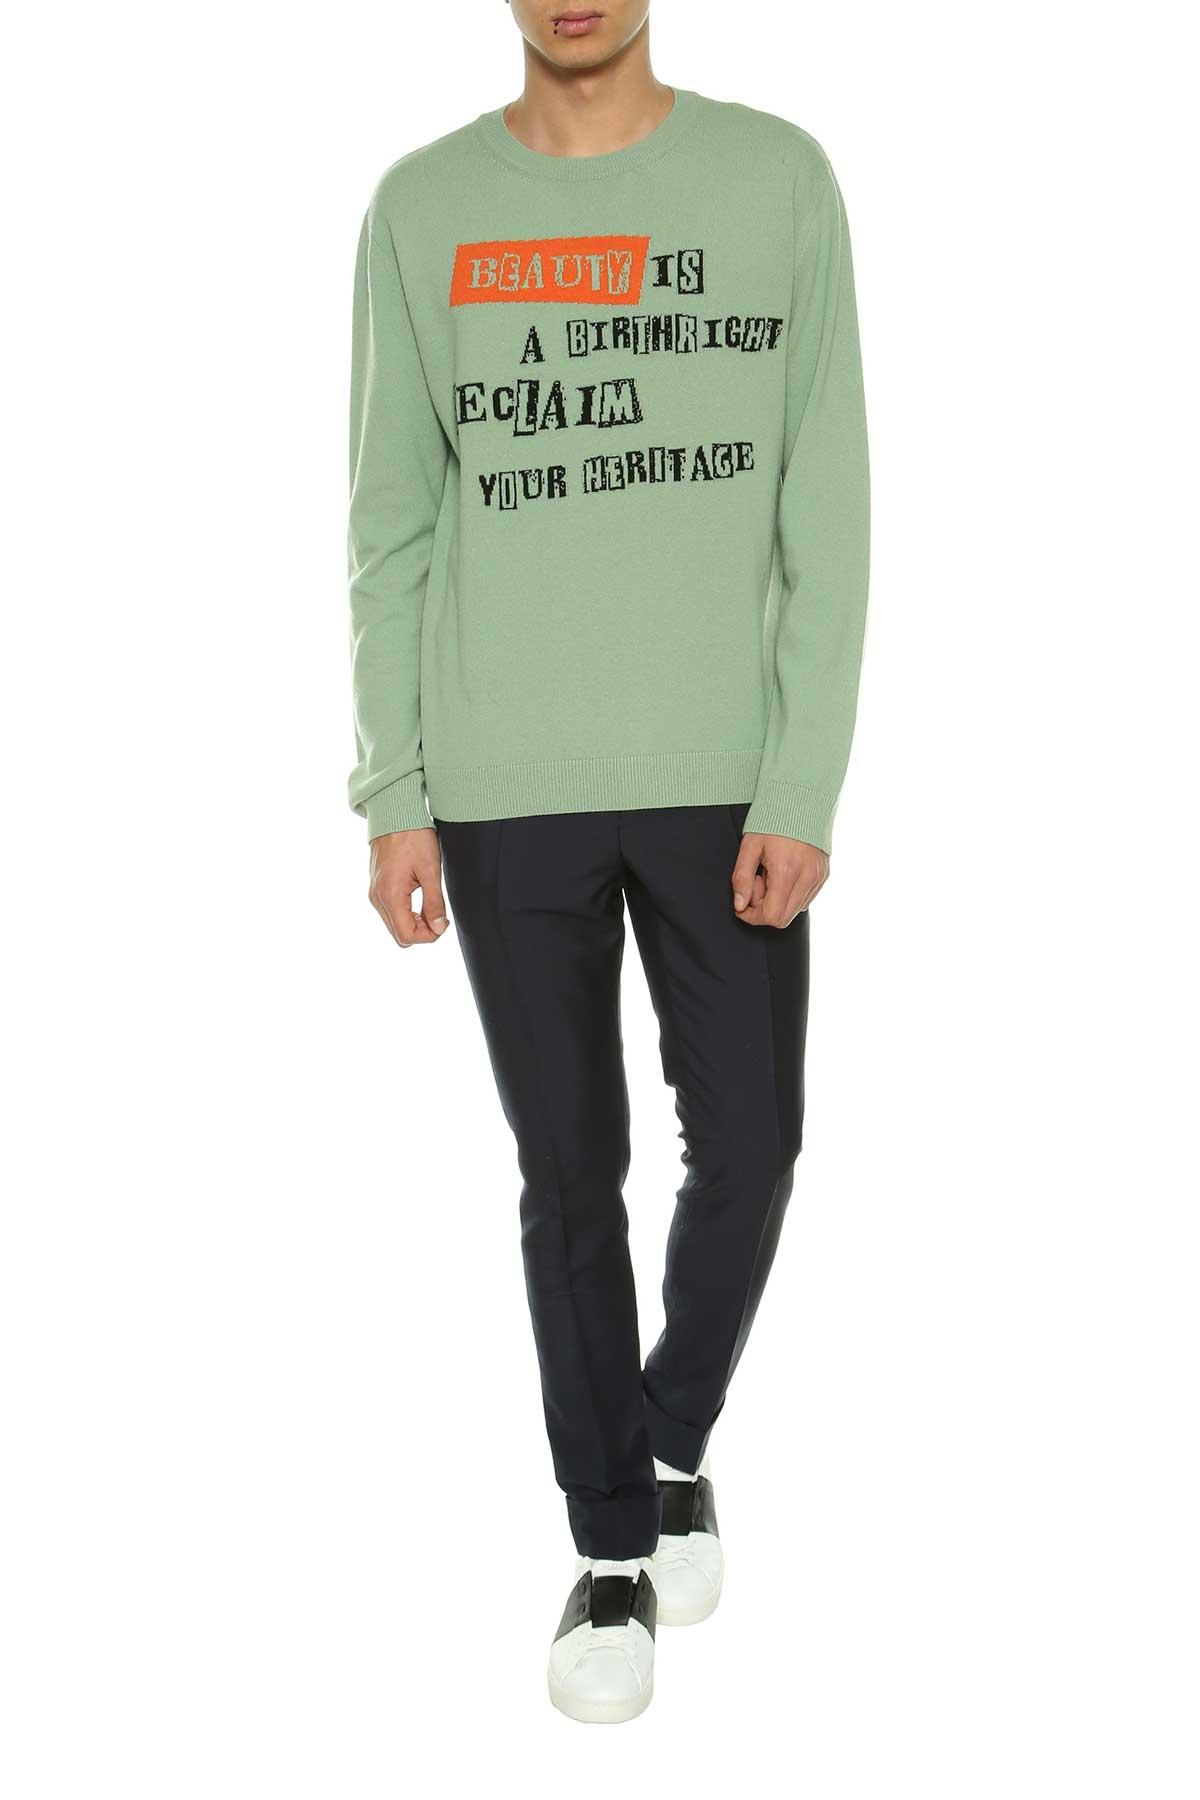 Valentino Valentino Sweater With Writings